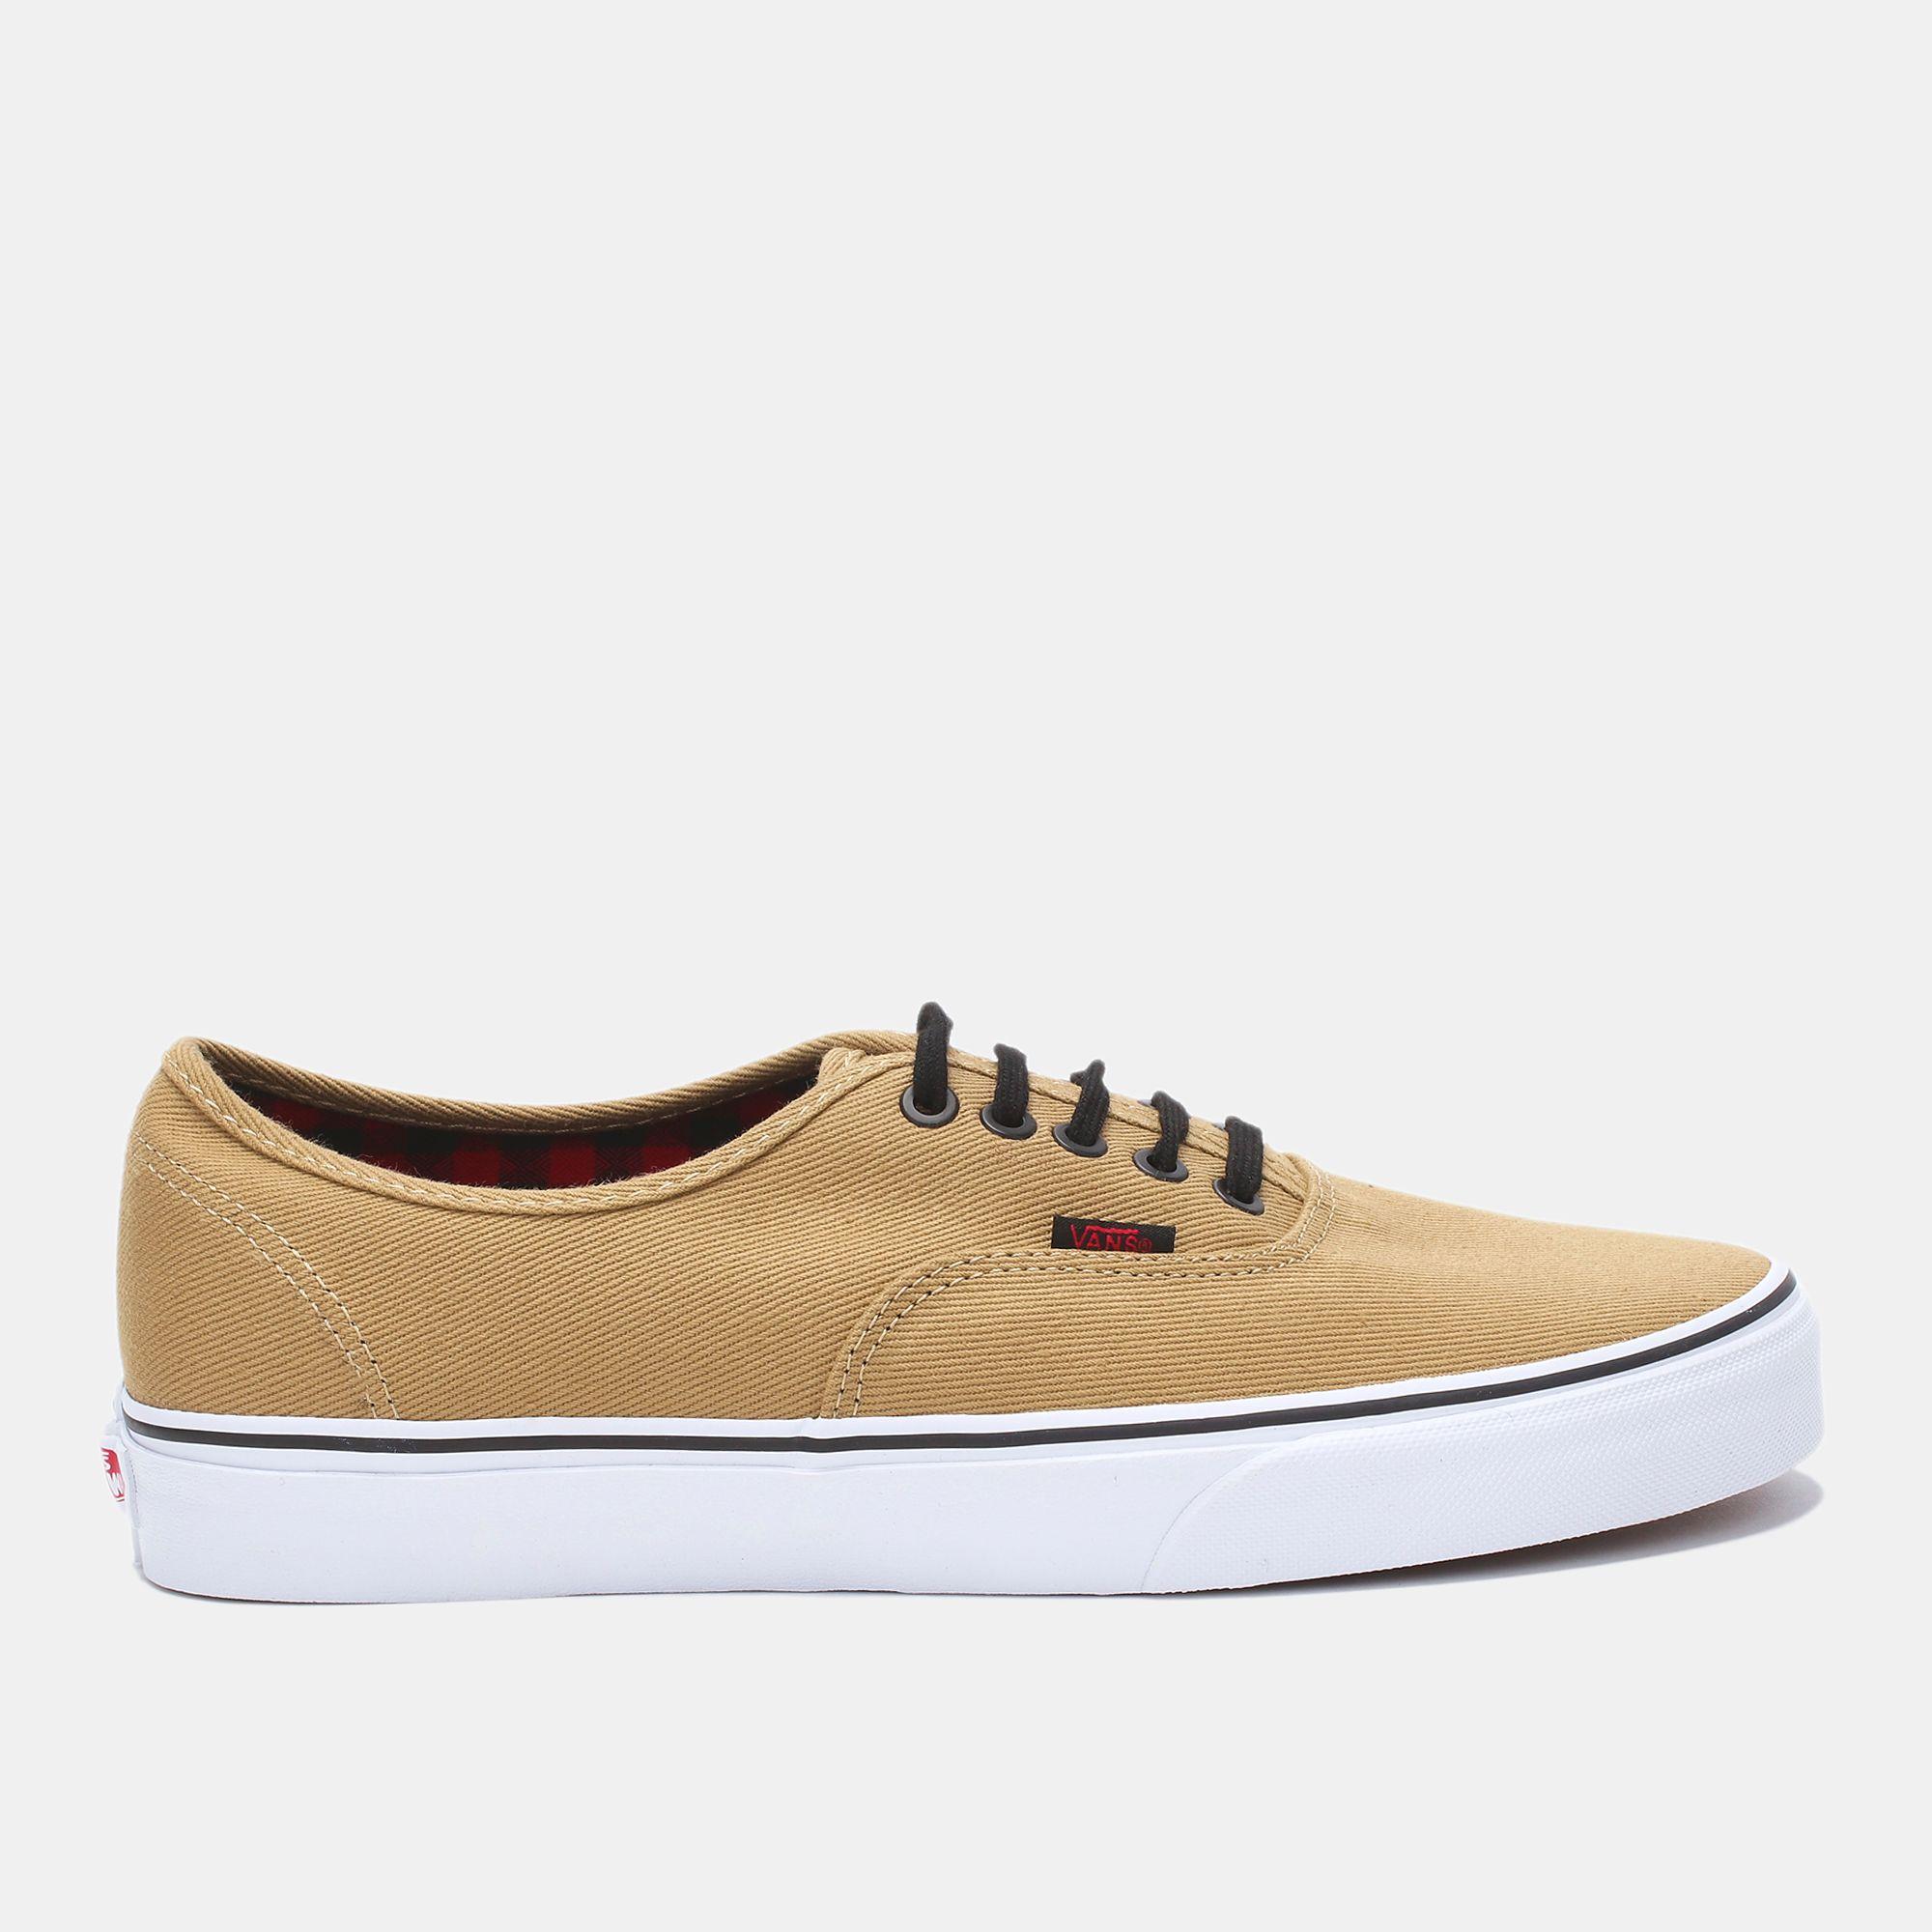 48adb9234 Shop بيج حذاء أوثنتِك من ڤانس for للرجال by Vans | سن أند ساند سبورتس